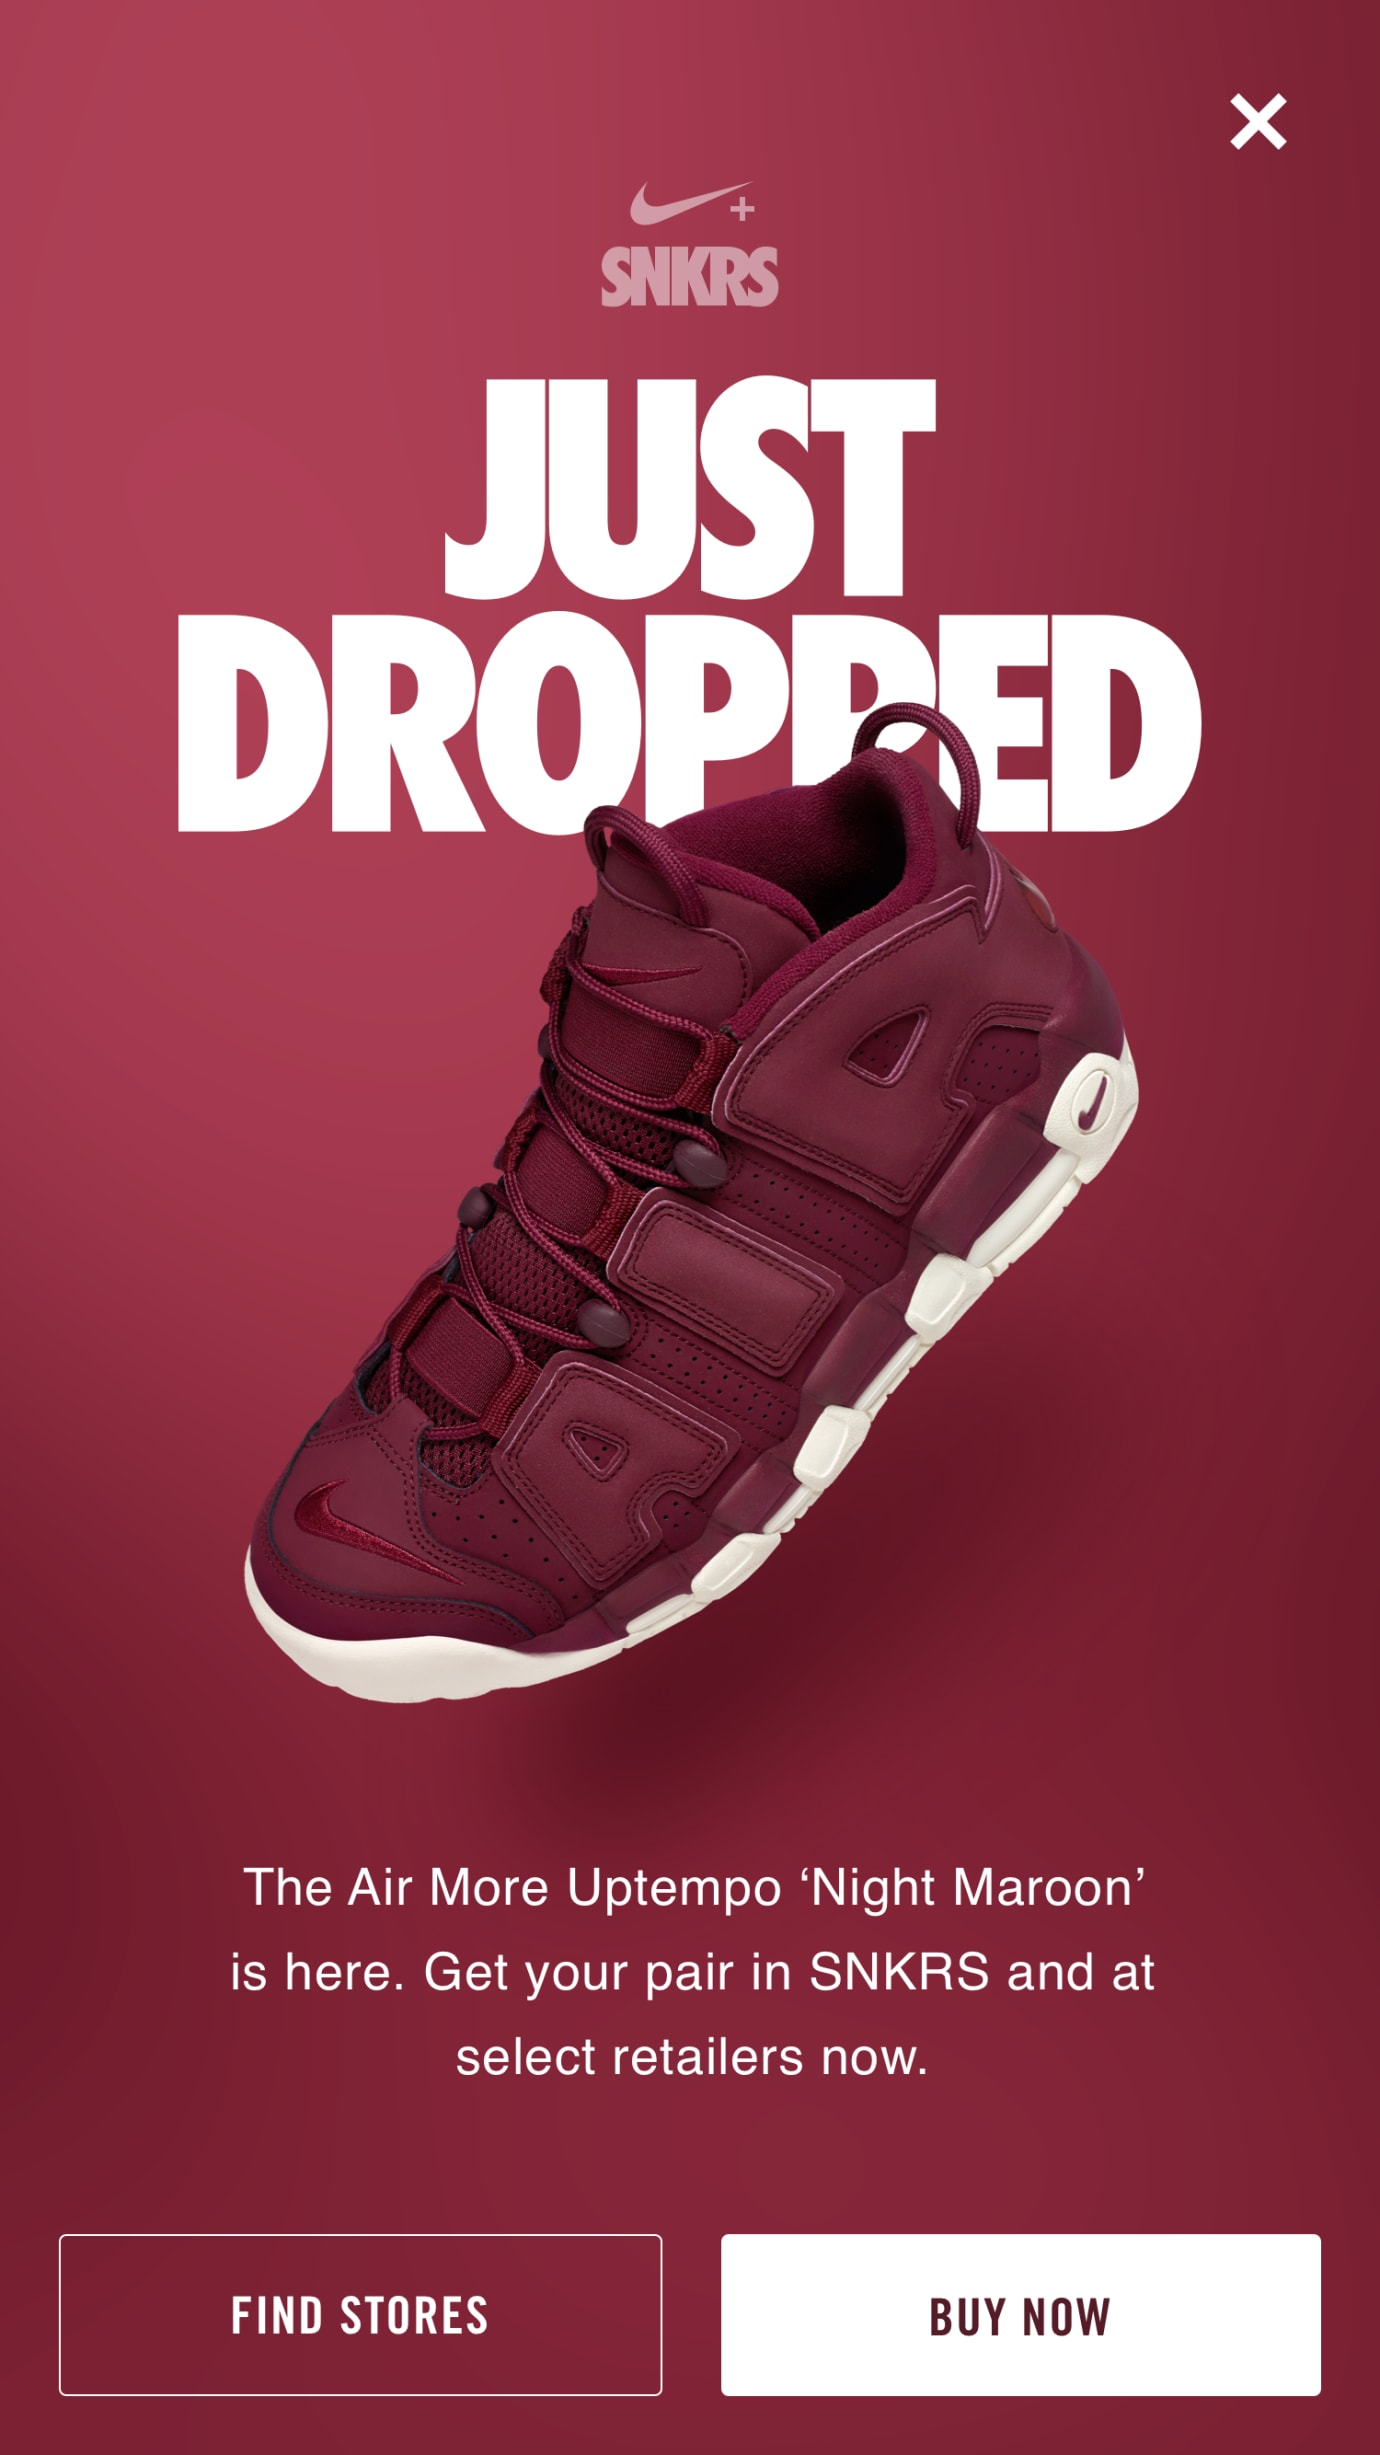 Nike SNKRS Night Maroon Uptempo